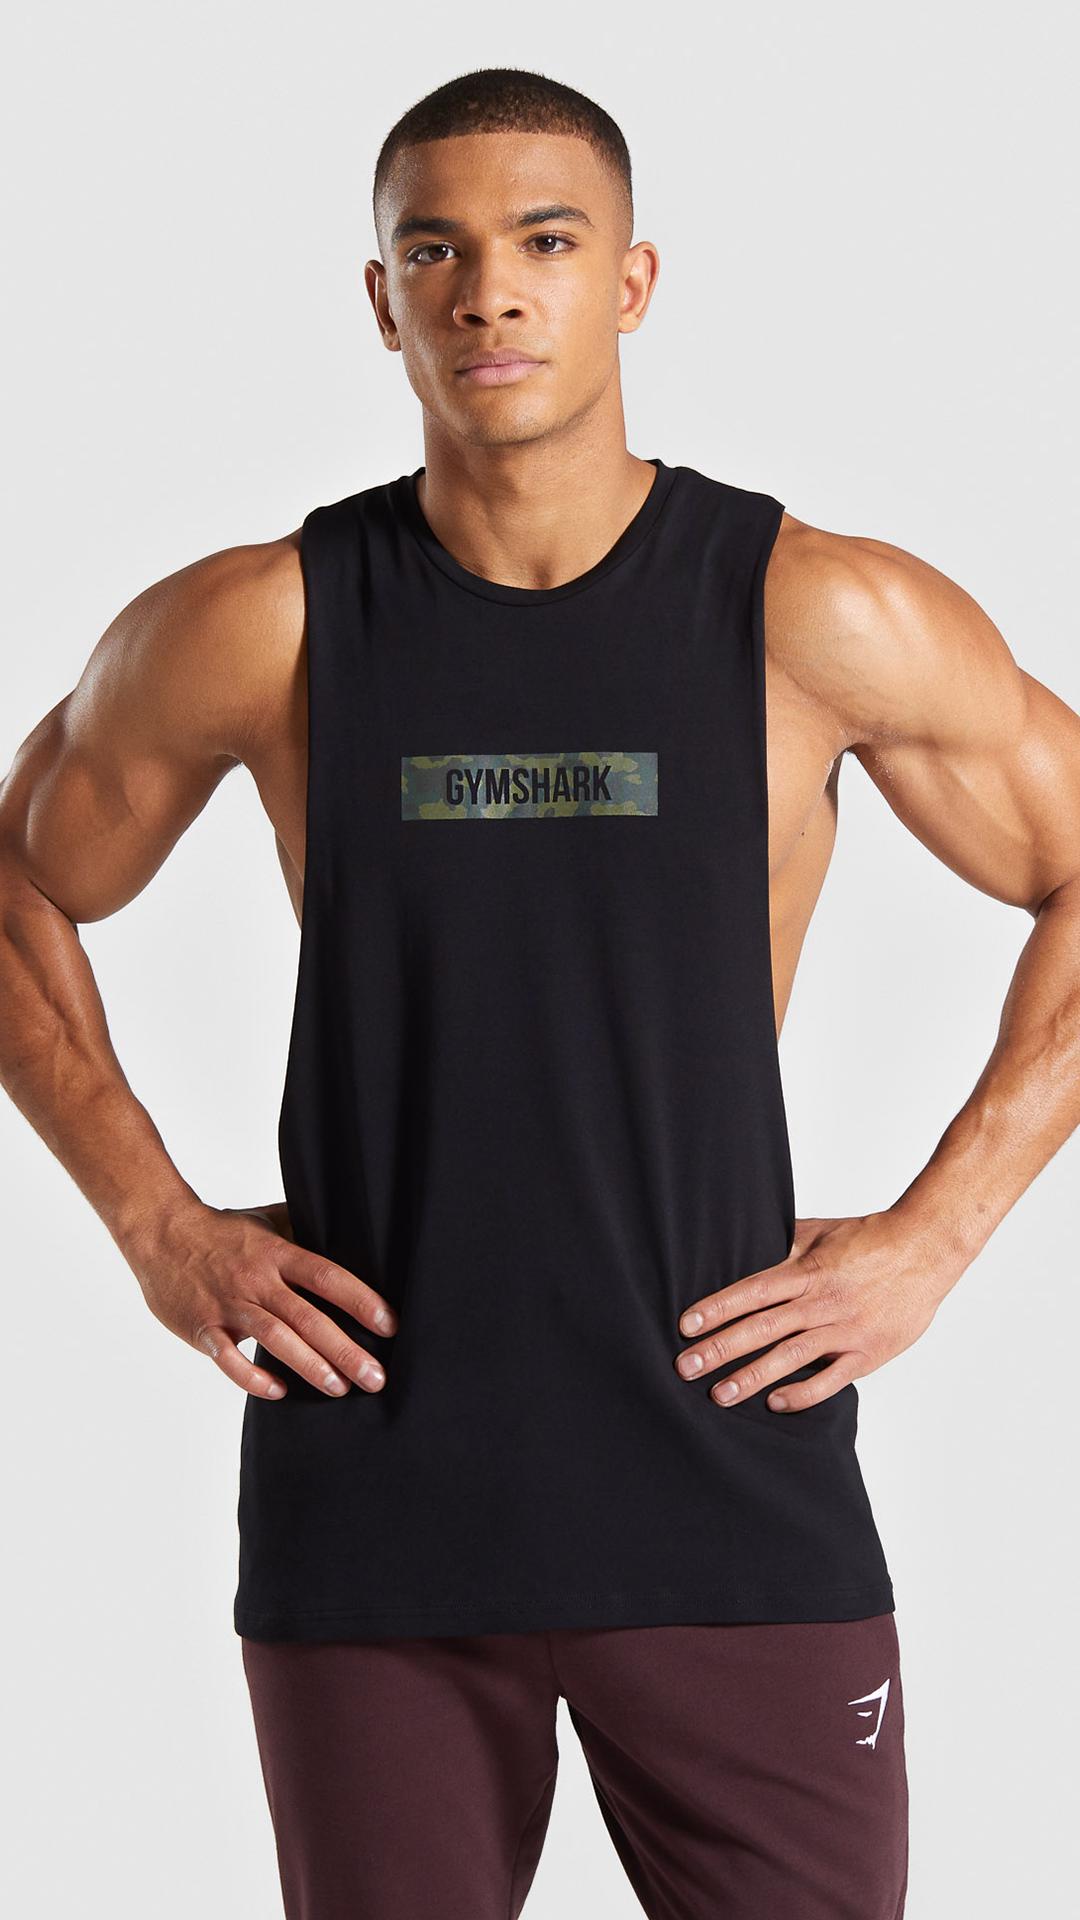 The Camo Logo Tank Black Gymshark Gym Sweat Train Perform Seamless Exercise Strength Strong Power Fitness Outfitinspiration Roupas Homens Camila